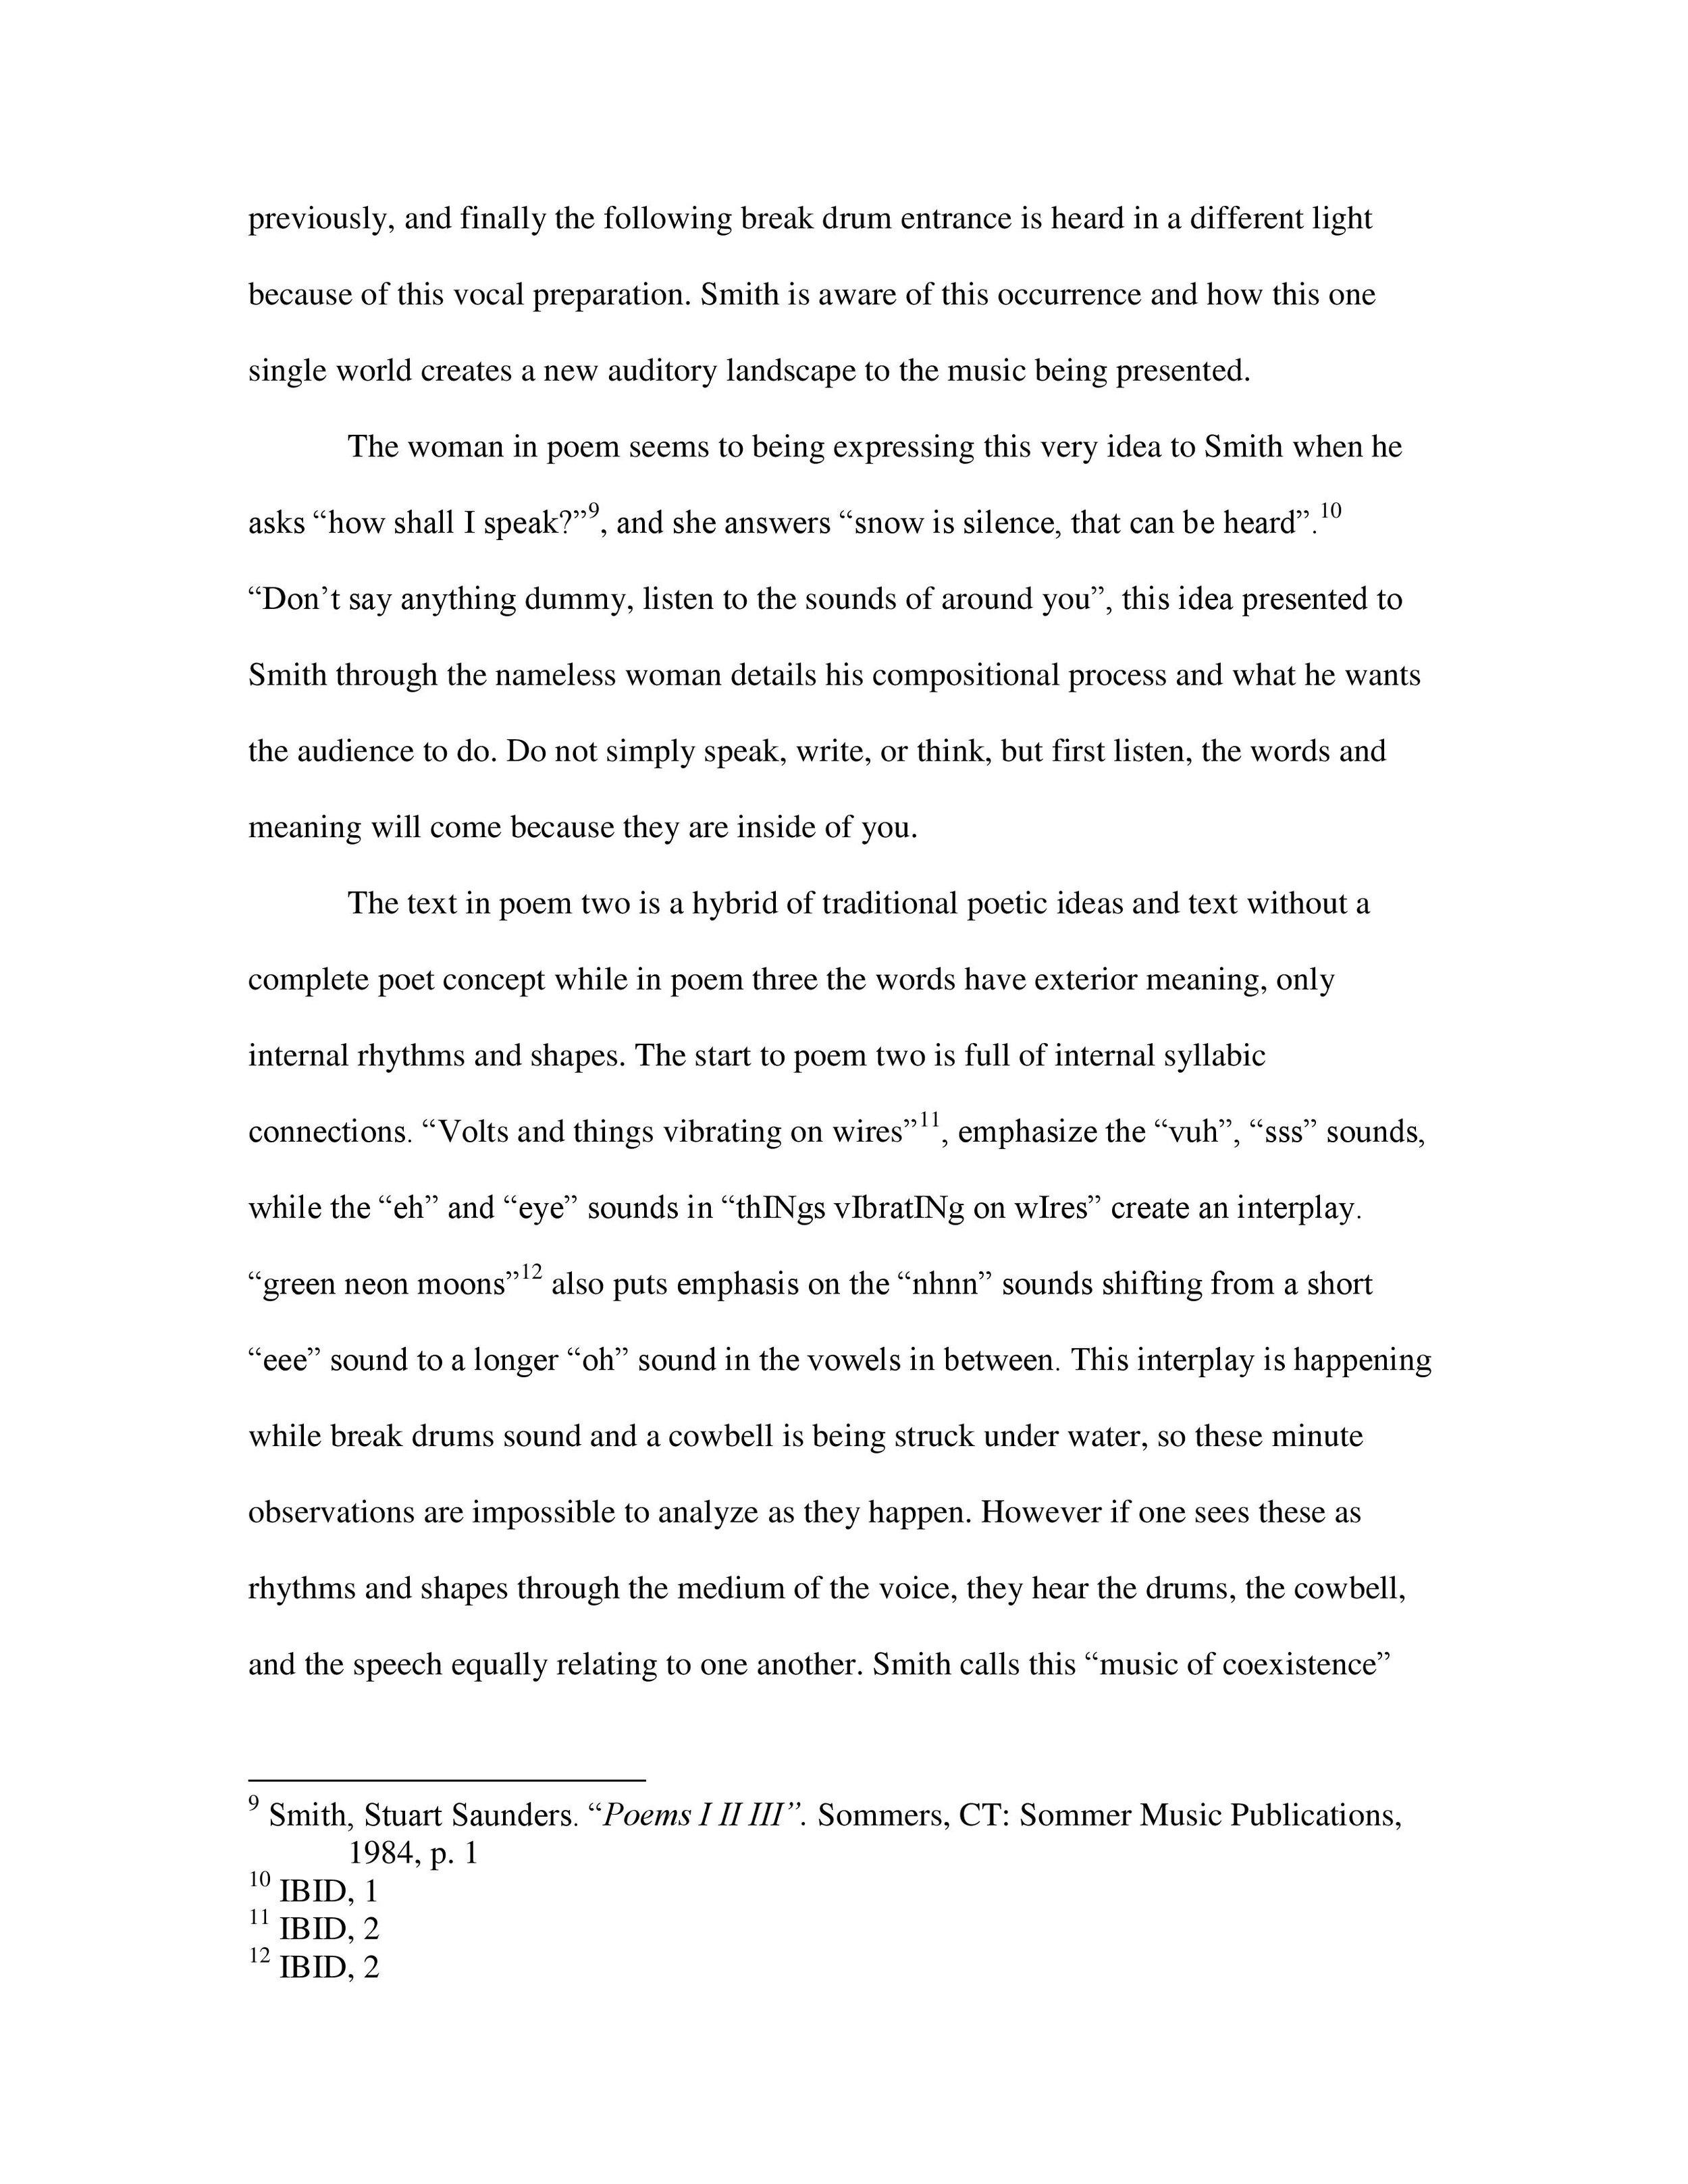 Smith Talk-page-004.jpg